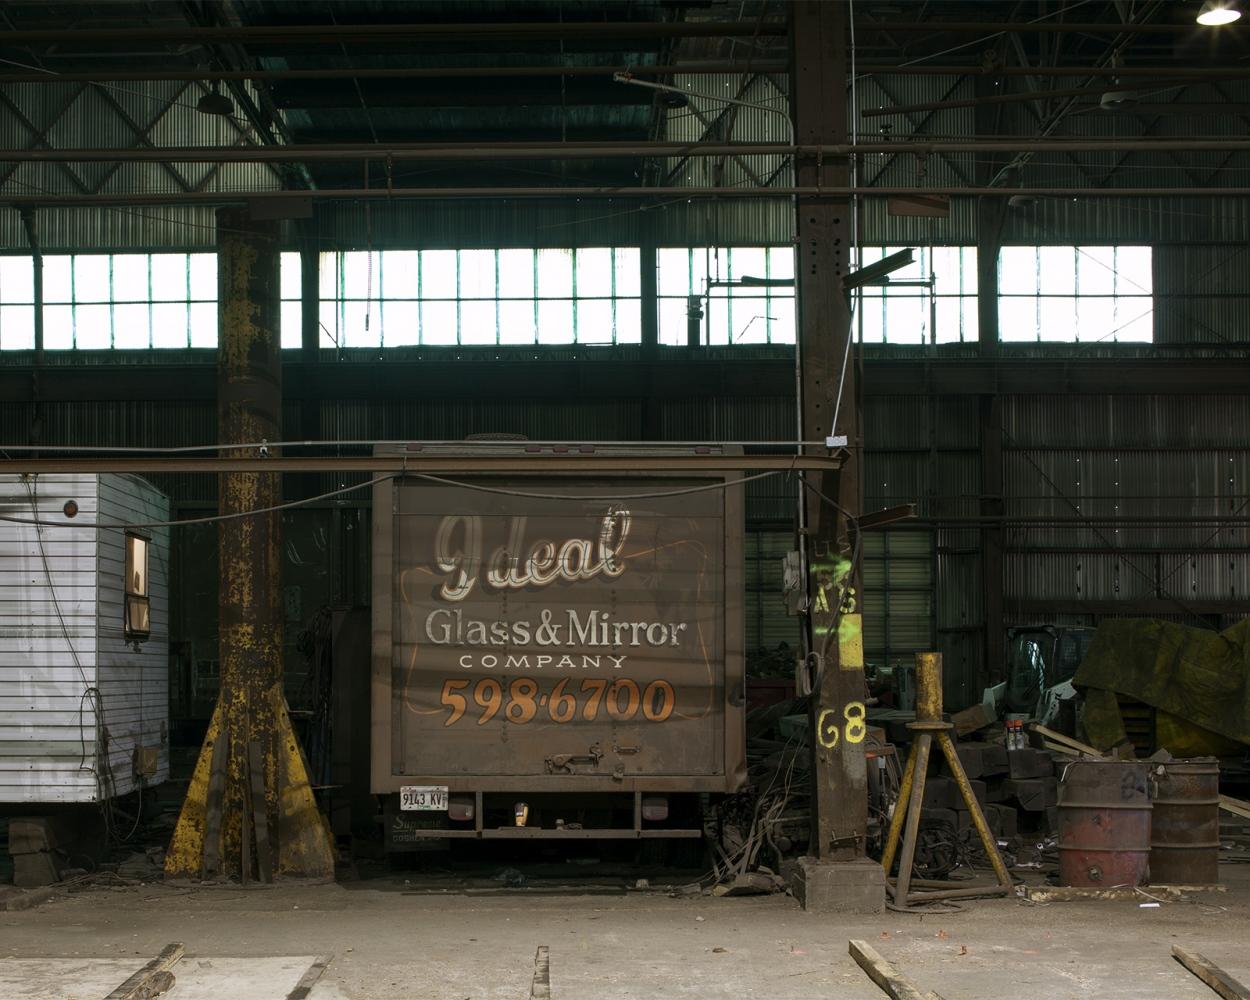 Box Truck (MWS), Hammond, IN 2013